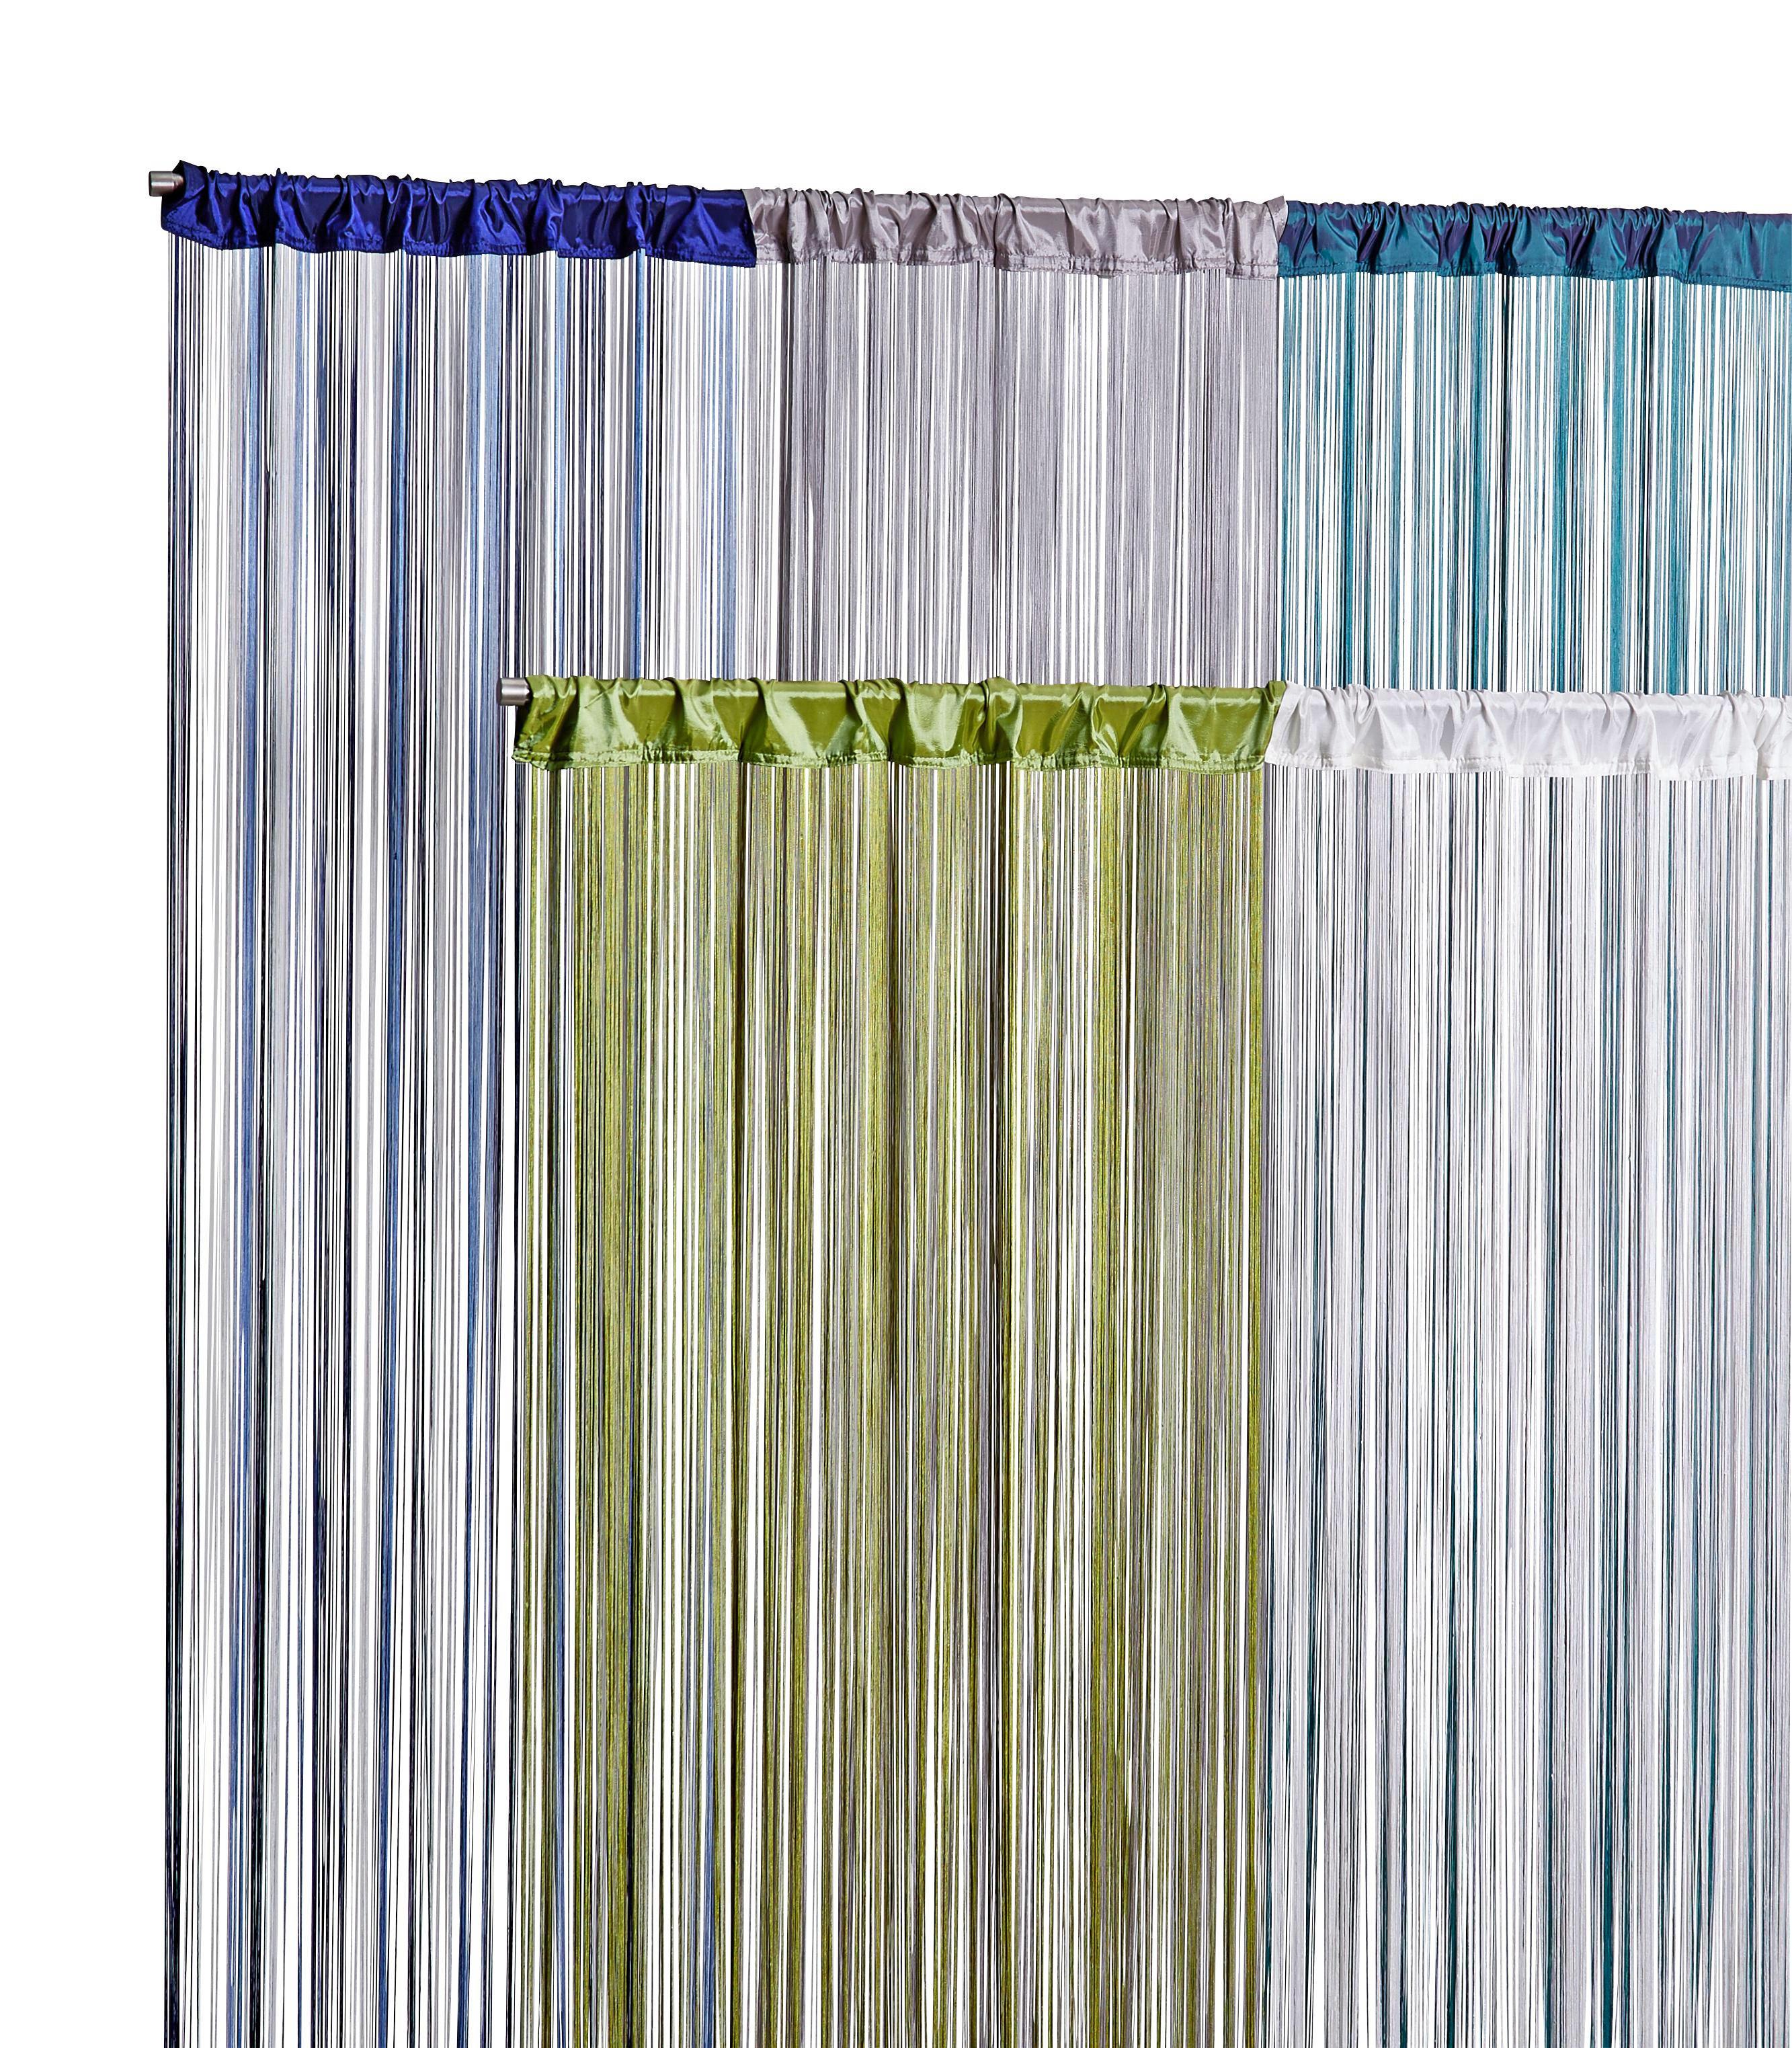 TRÅDGARDIN - naturfärgad, Klassisk, textil (90/245cm) - BOXXX